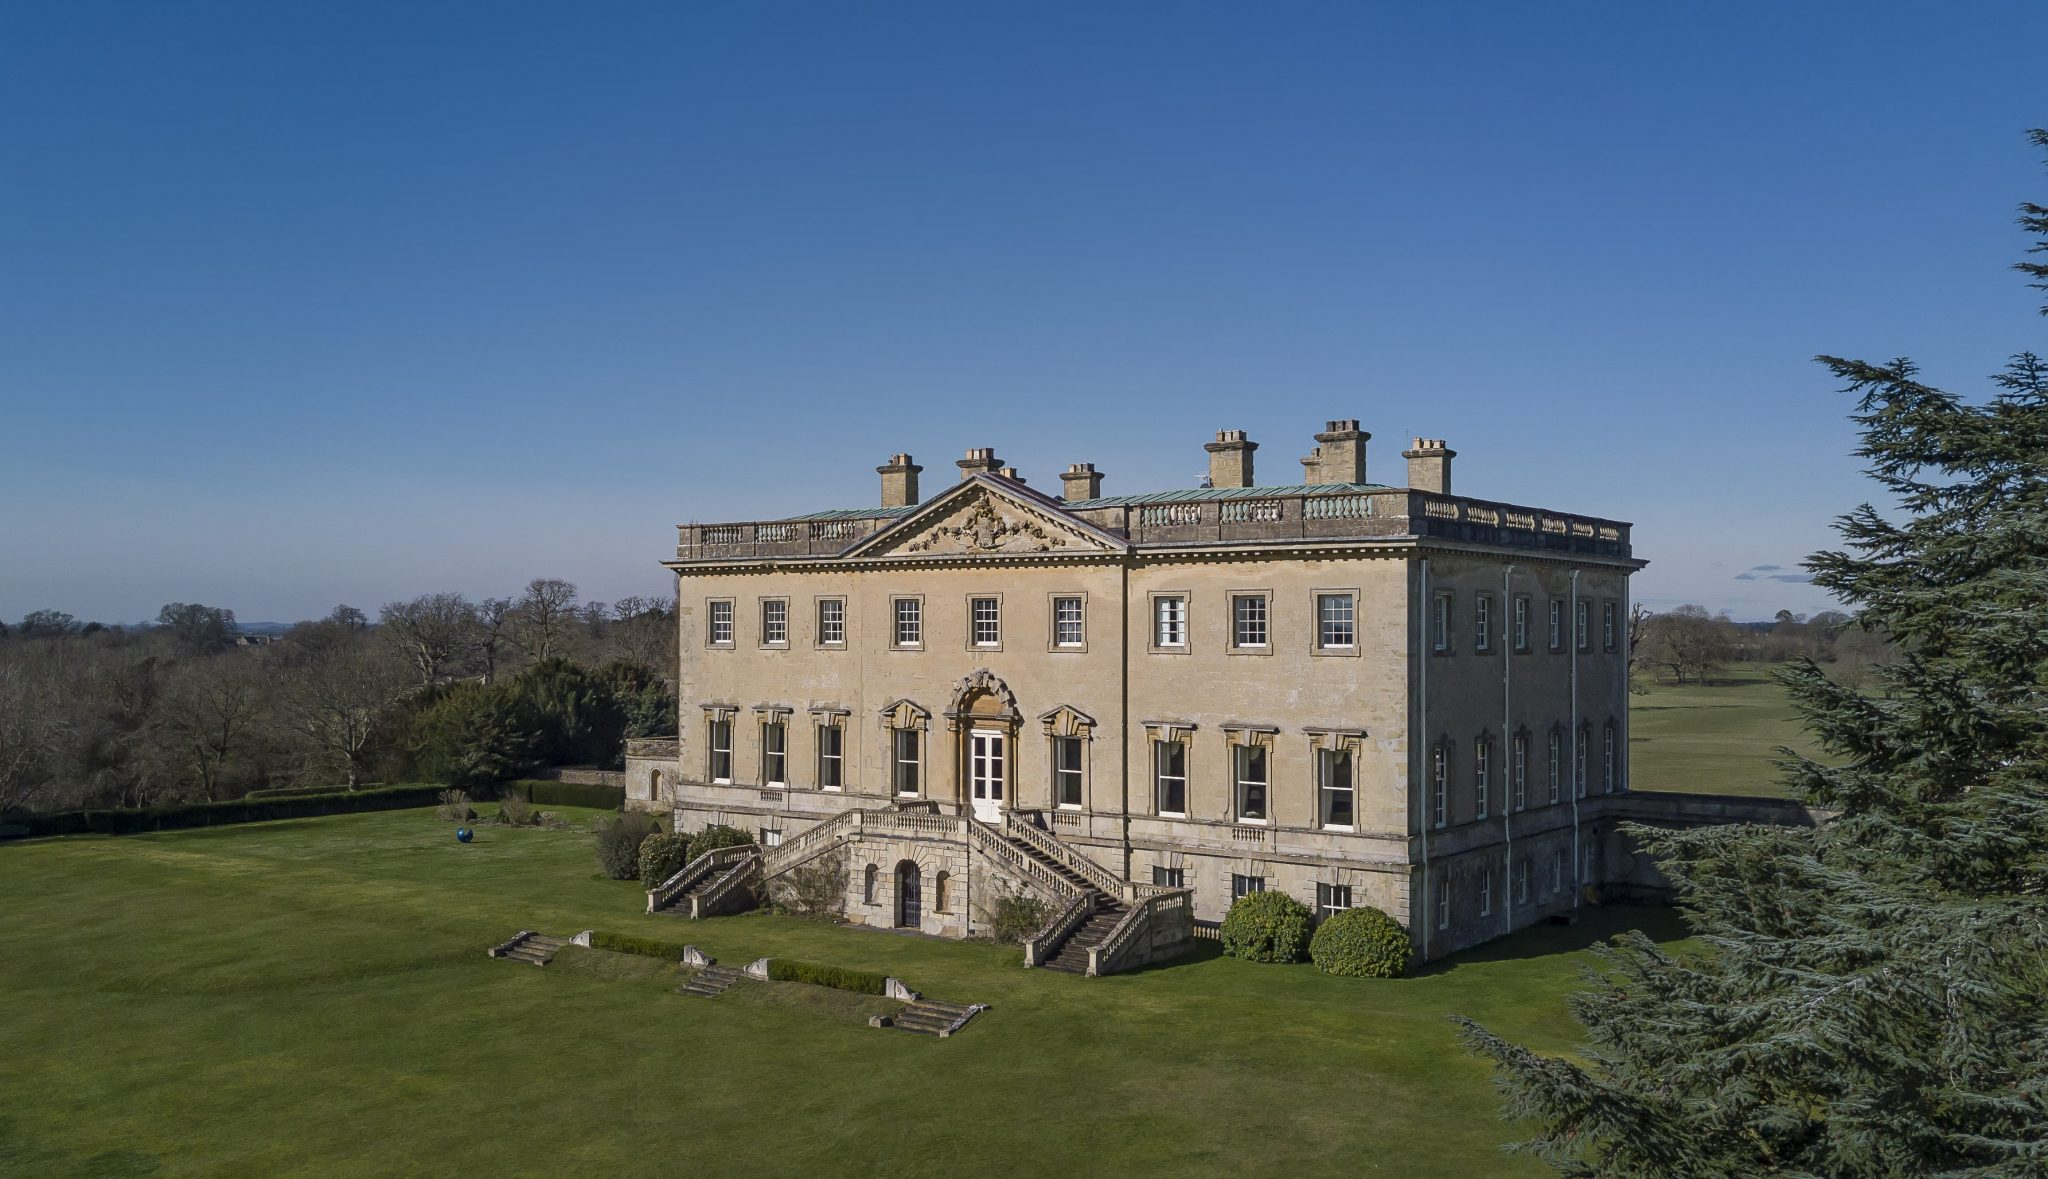 Kirklington Park House in Oxfordshire